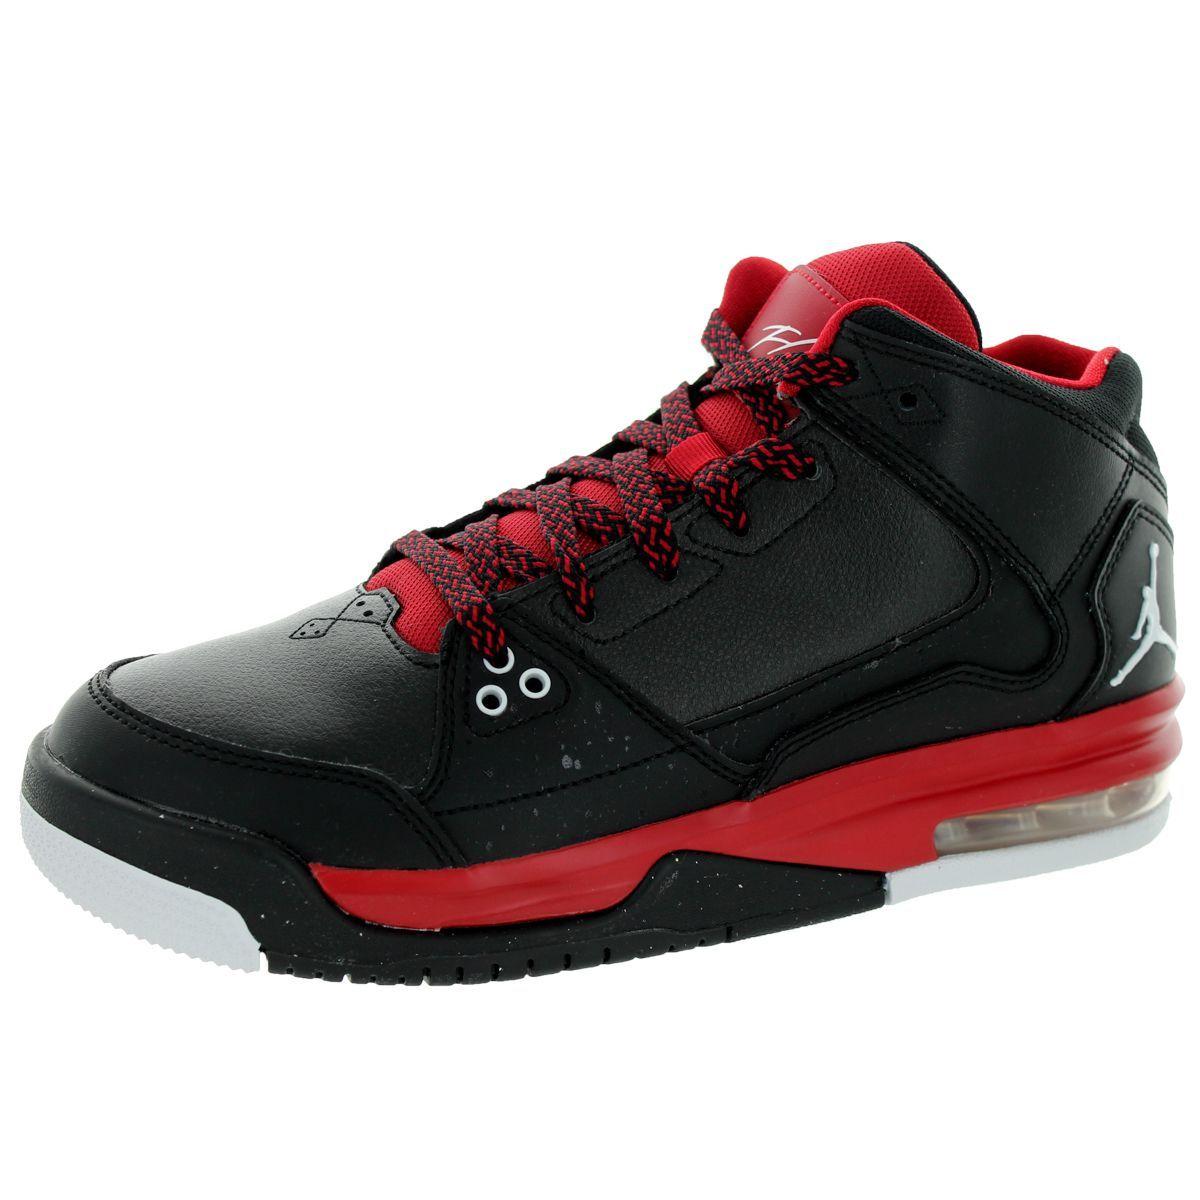 5f9798d763d485 Nike Jordan Kid s Jordan Flight Origin Bg  White Gym Red Basketball Shoe